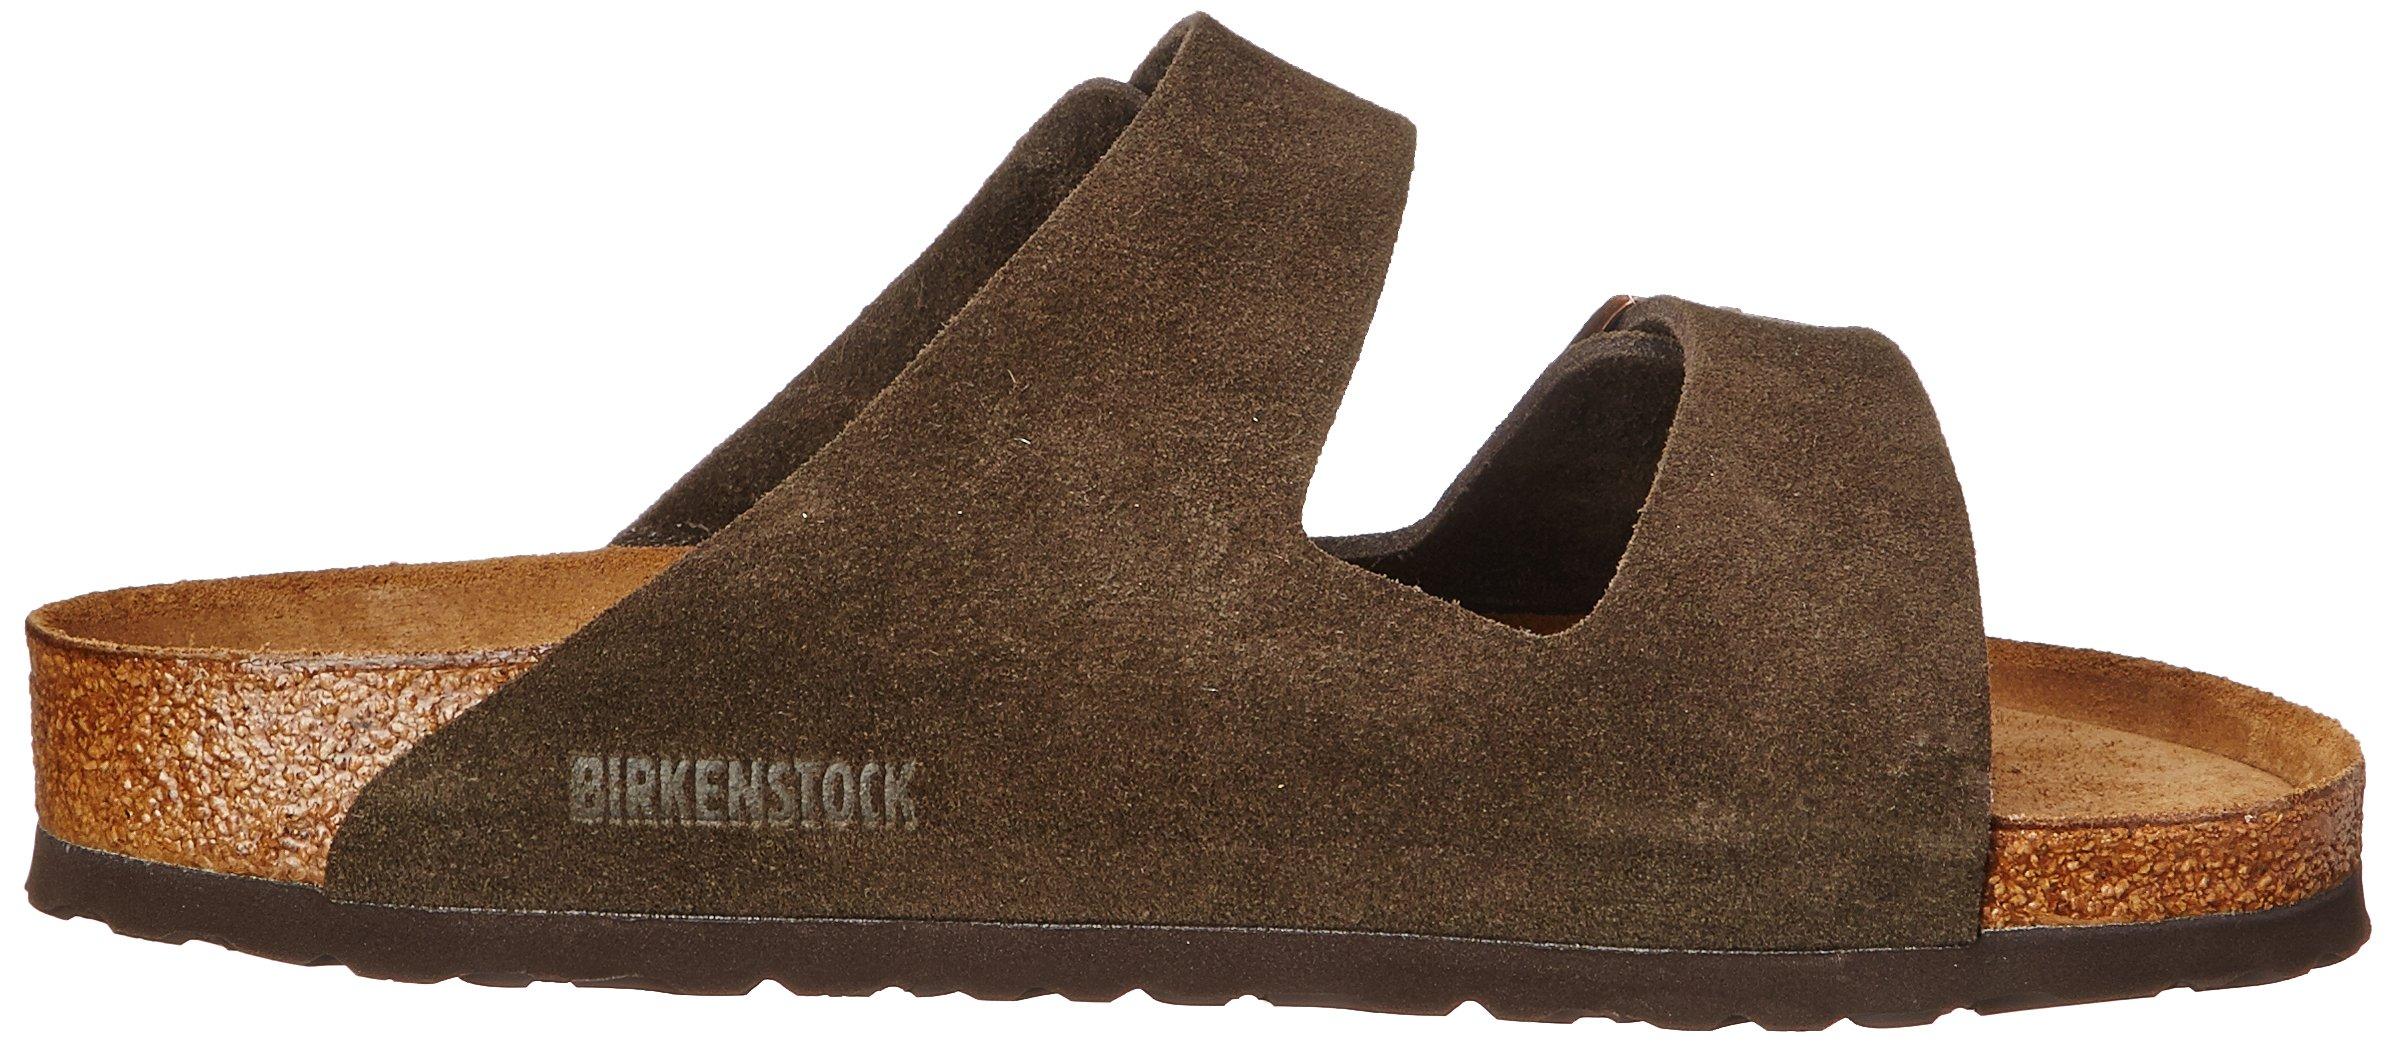 Birkenstock Unisex Arizona Mocha Suede Sandals - 35 N EU / 4-4.5 2A(N) US by Birkenstock (Image #7)